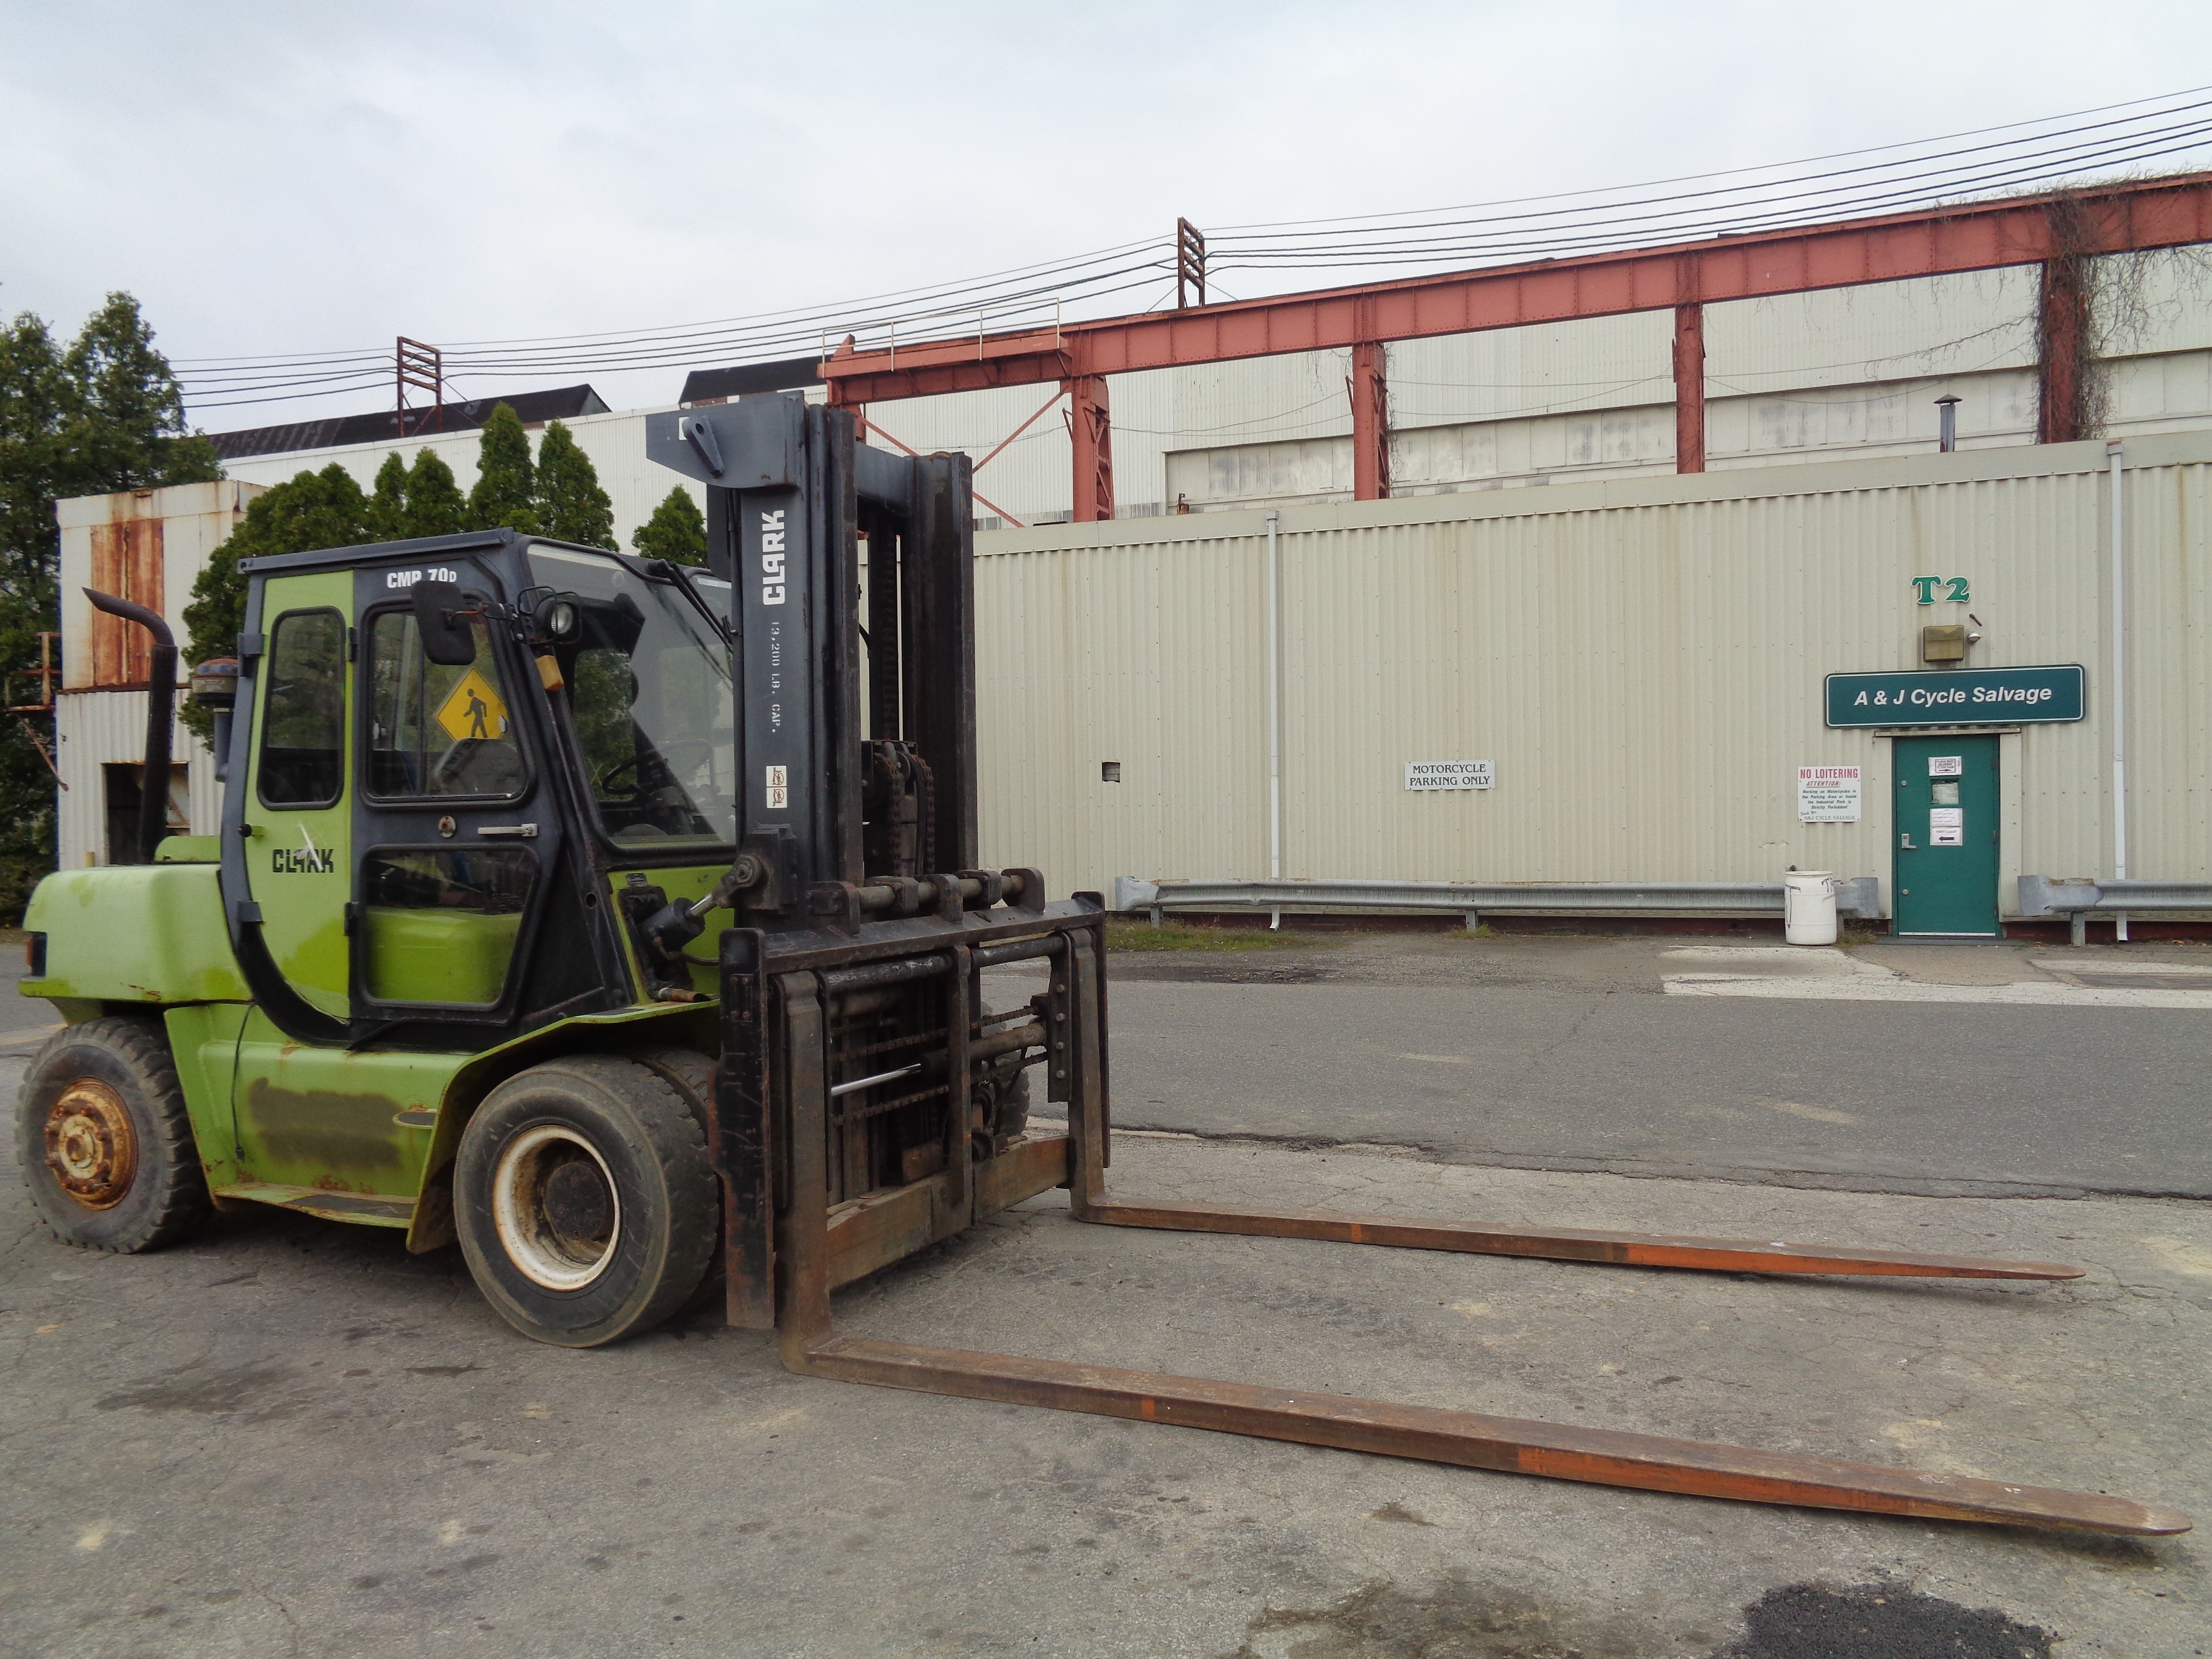 Lot 54 - Clark CMP700 Pneumatic Tire Forklift